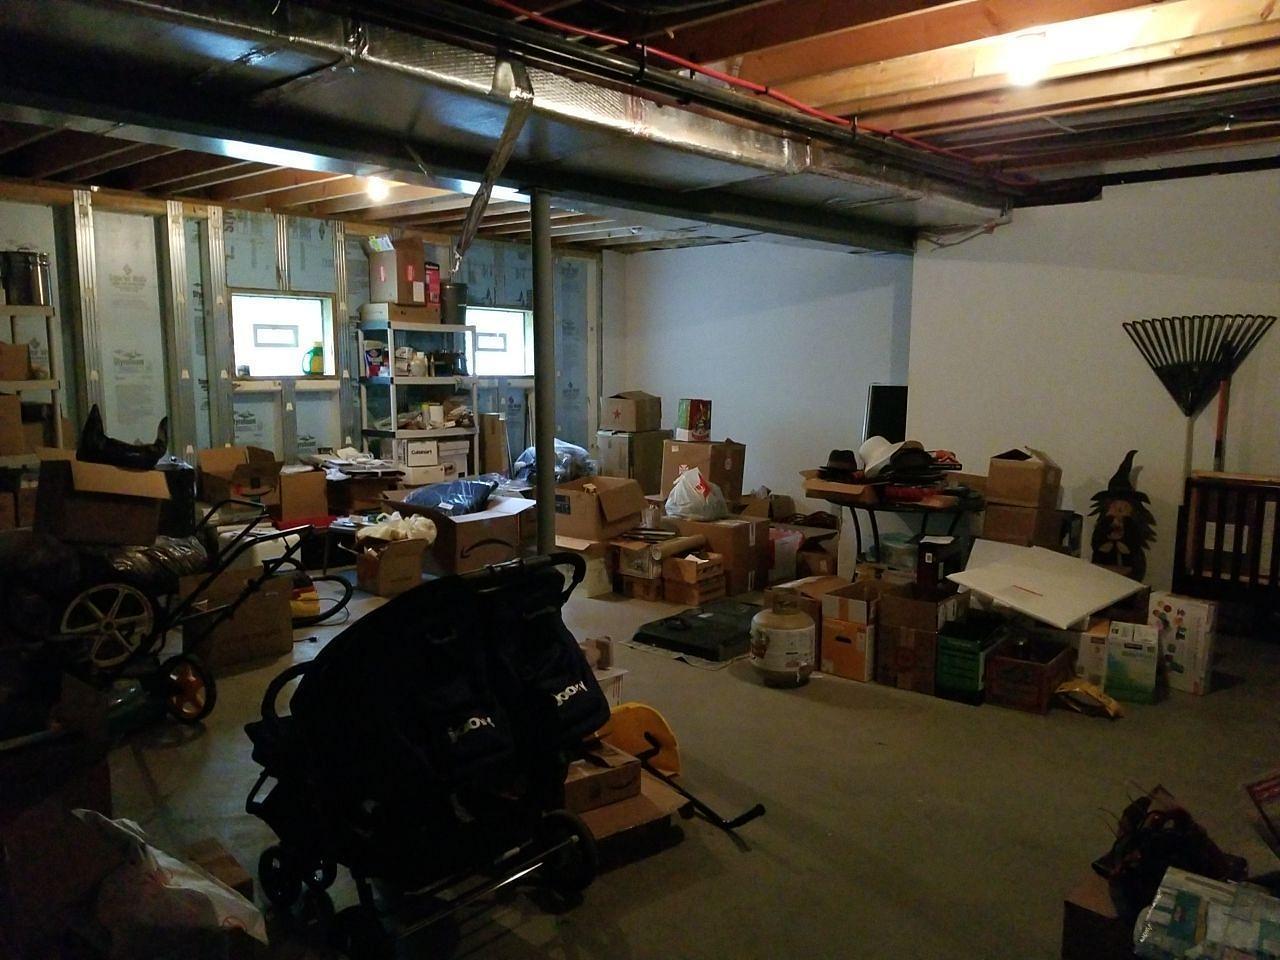 Basement Transformed into Playroom in Venetia, PA! - Before Photo